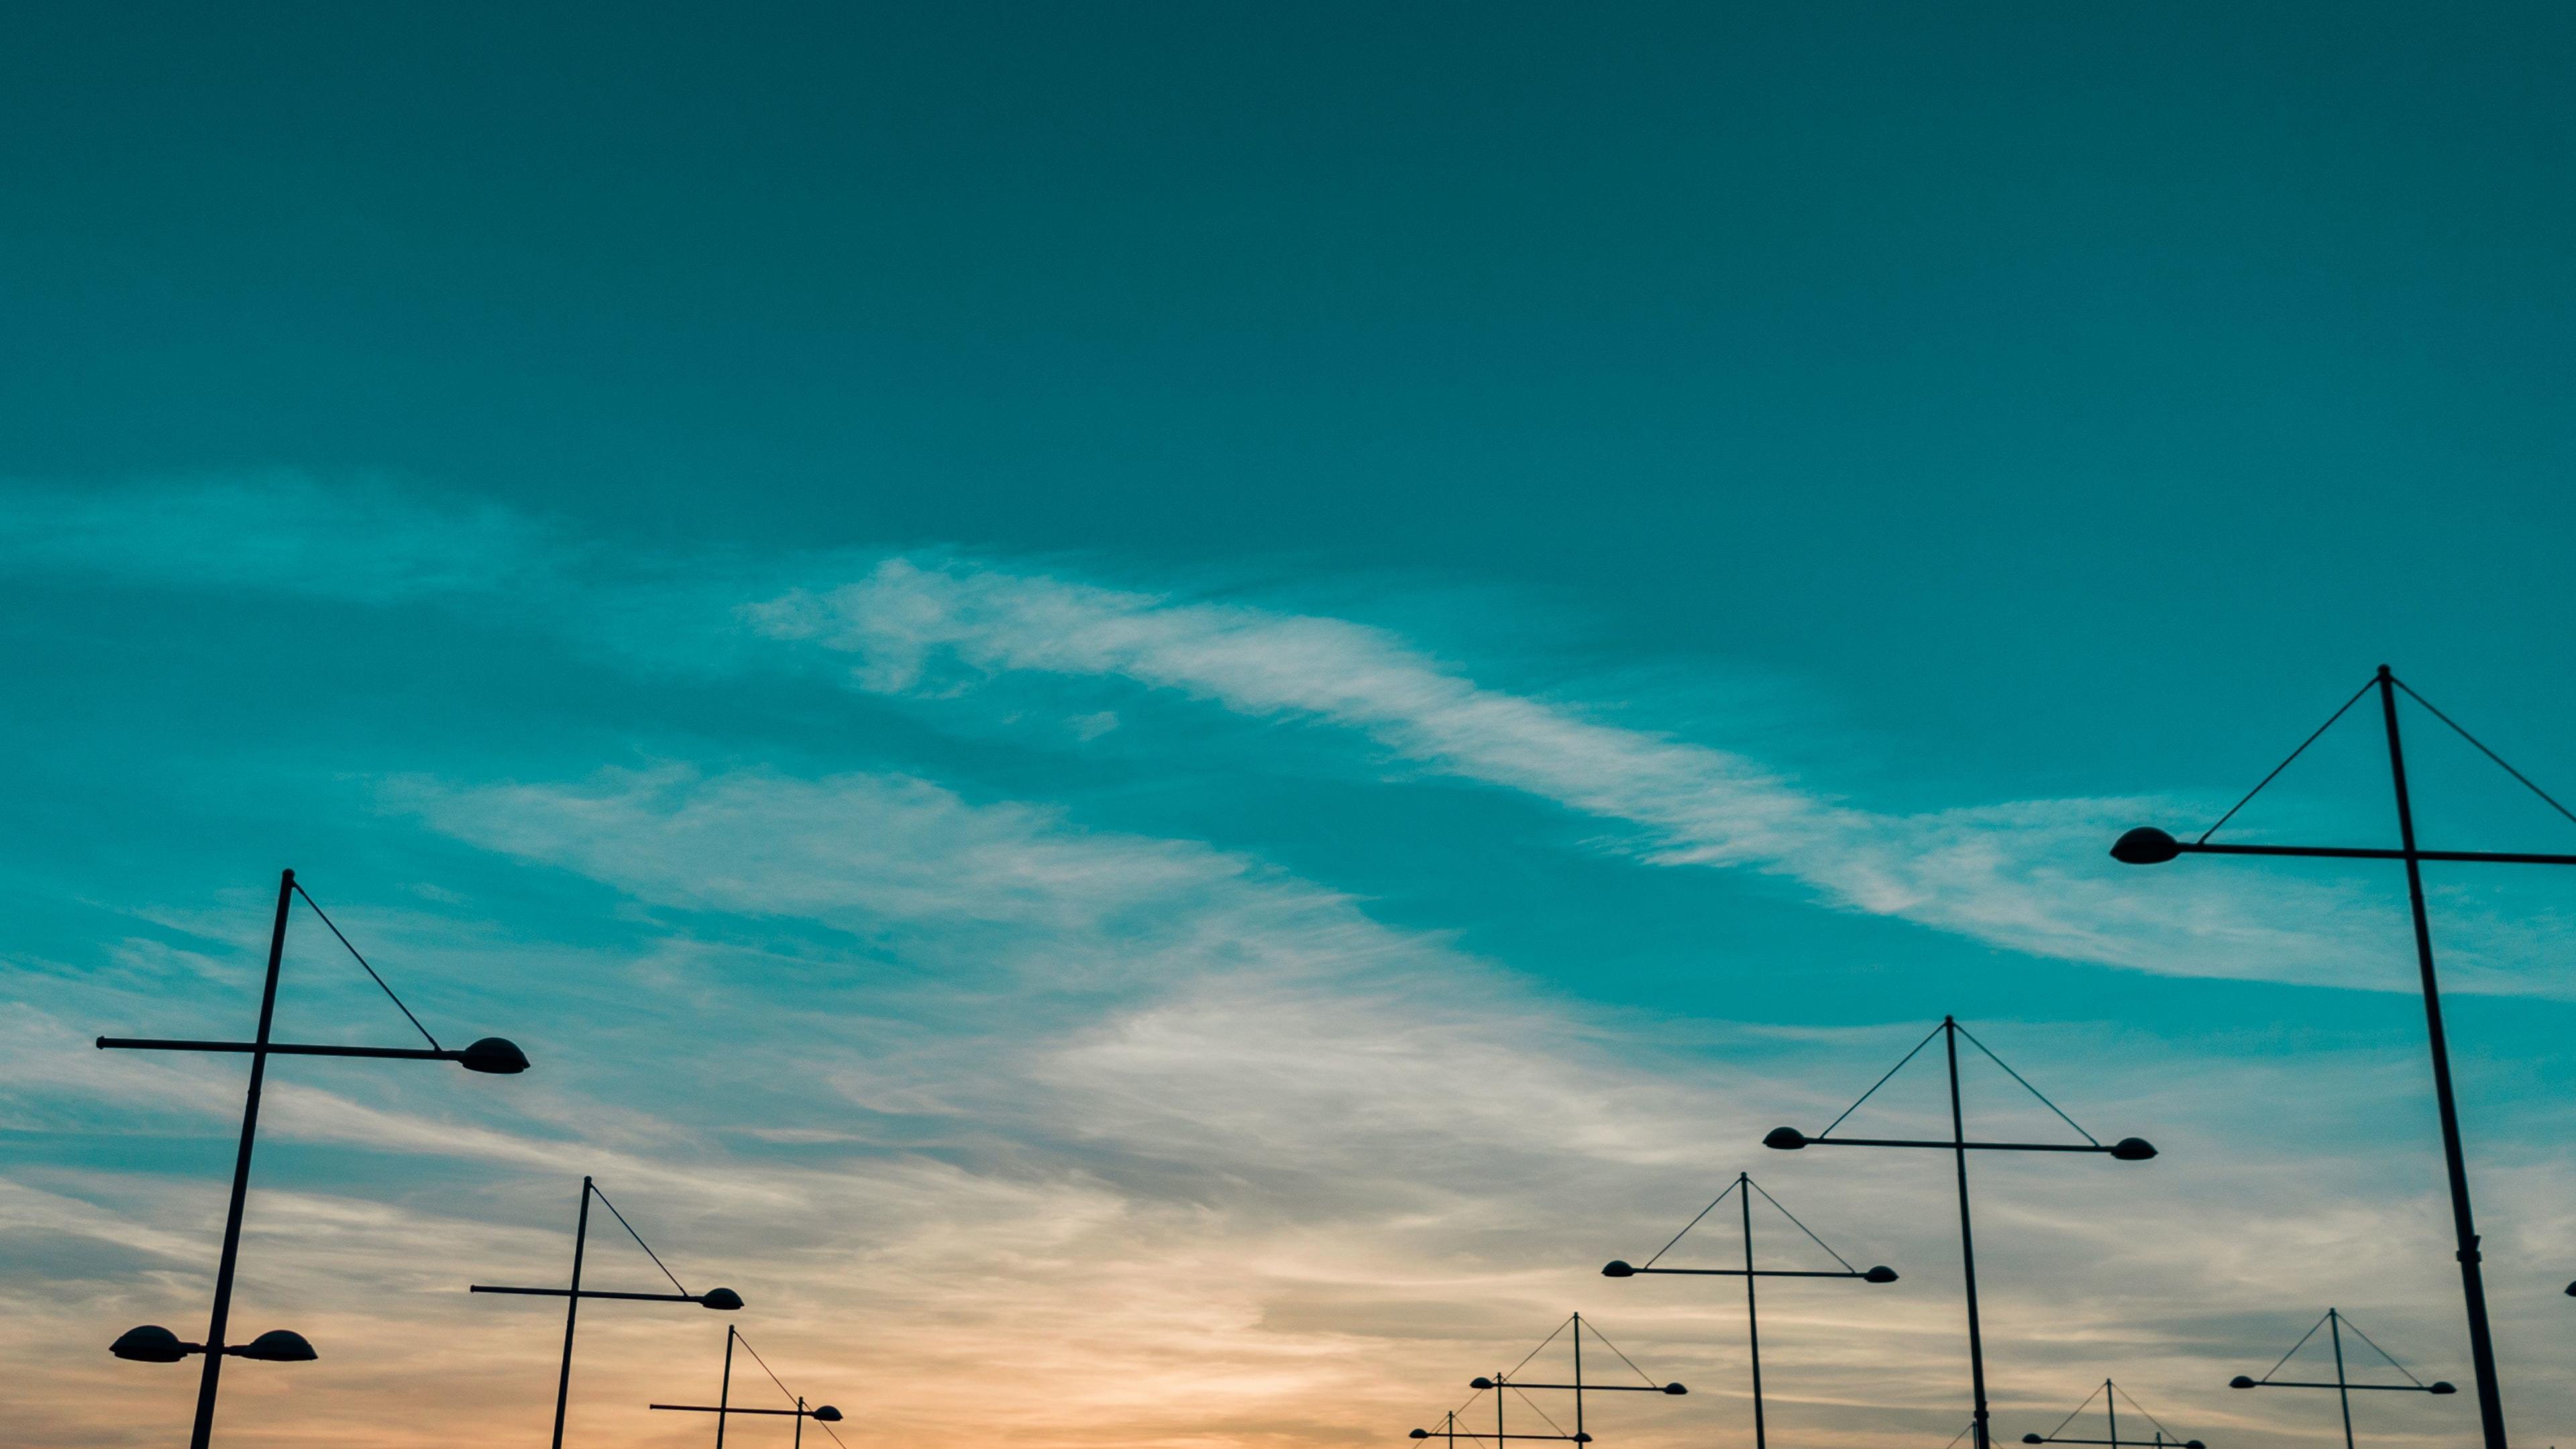 Sunset, landscape, skyline, 3840x2160 wallpaper